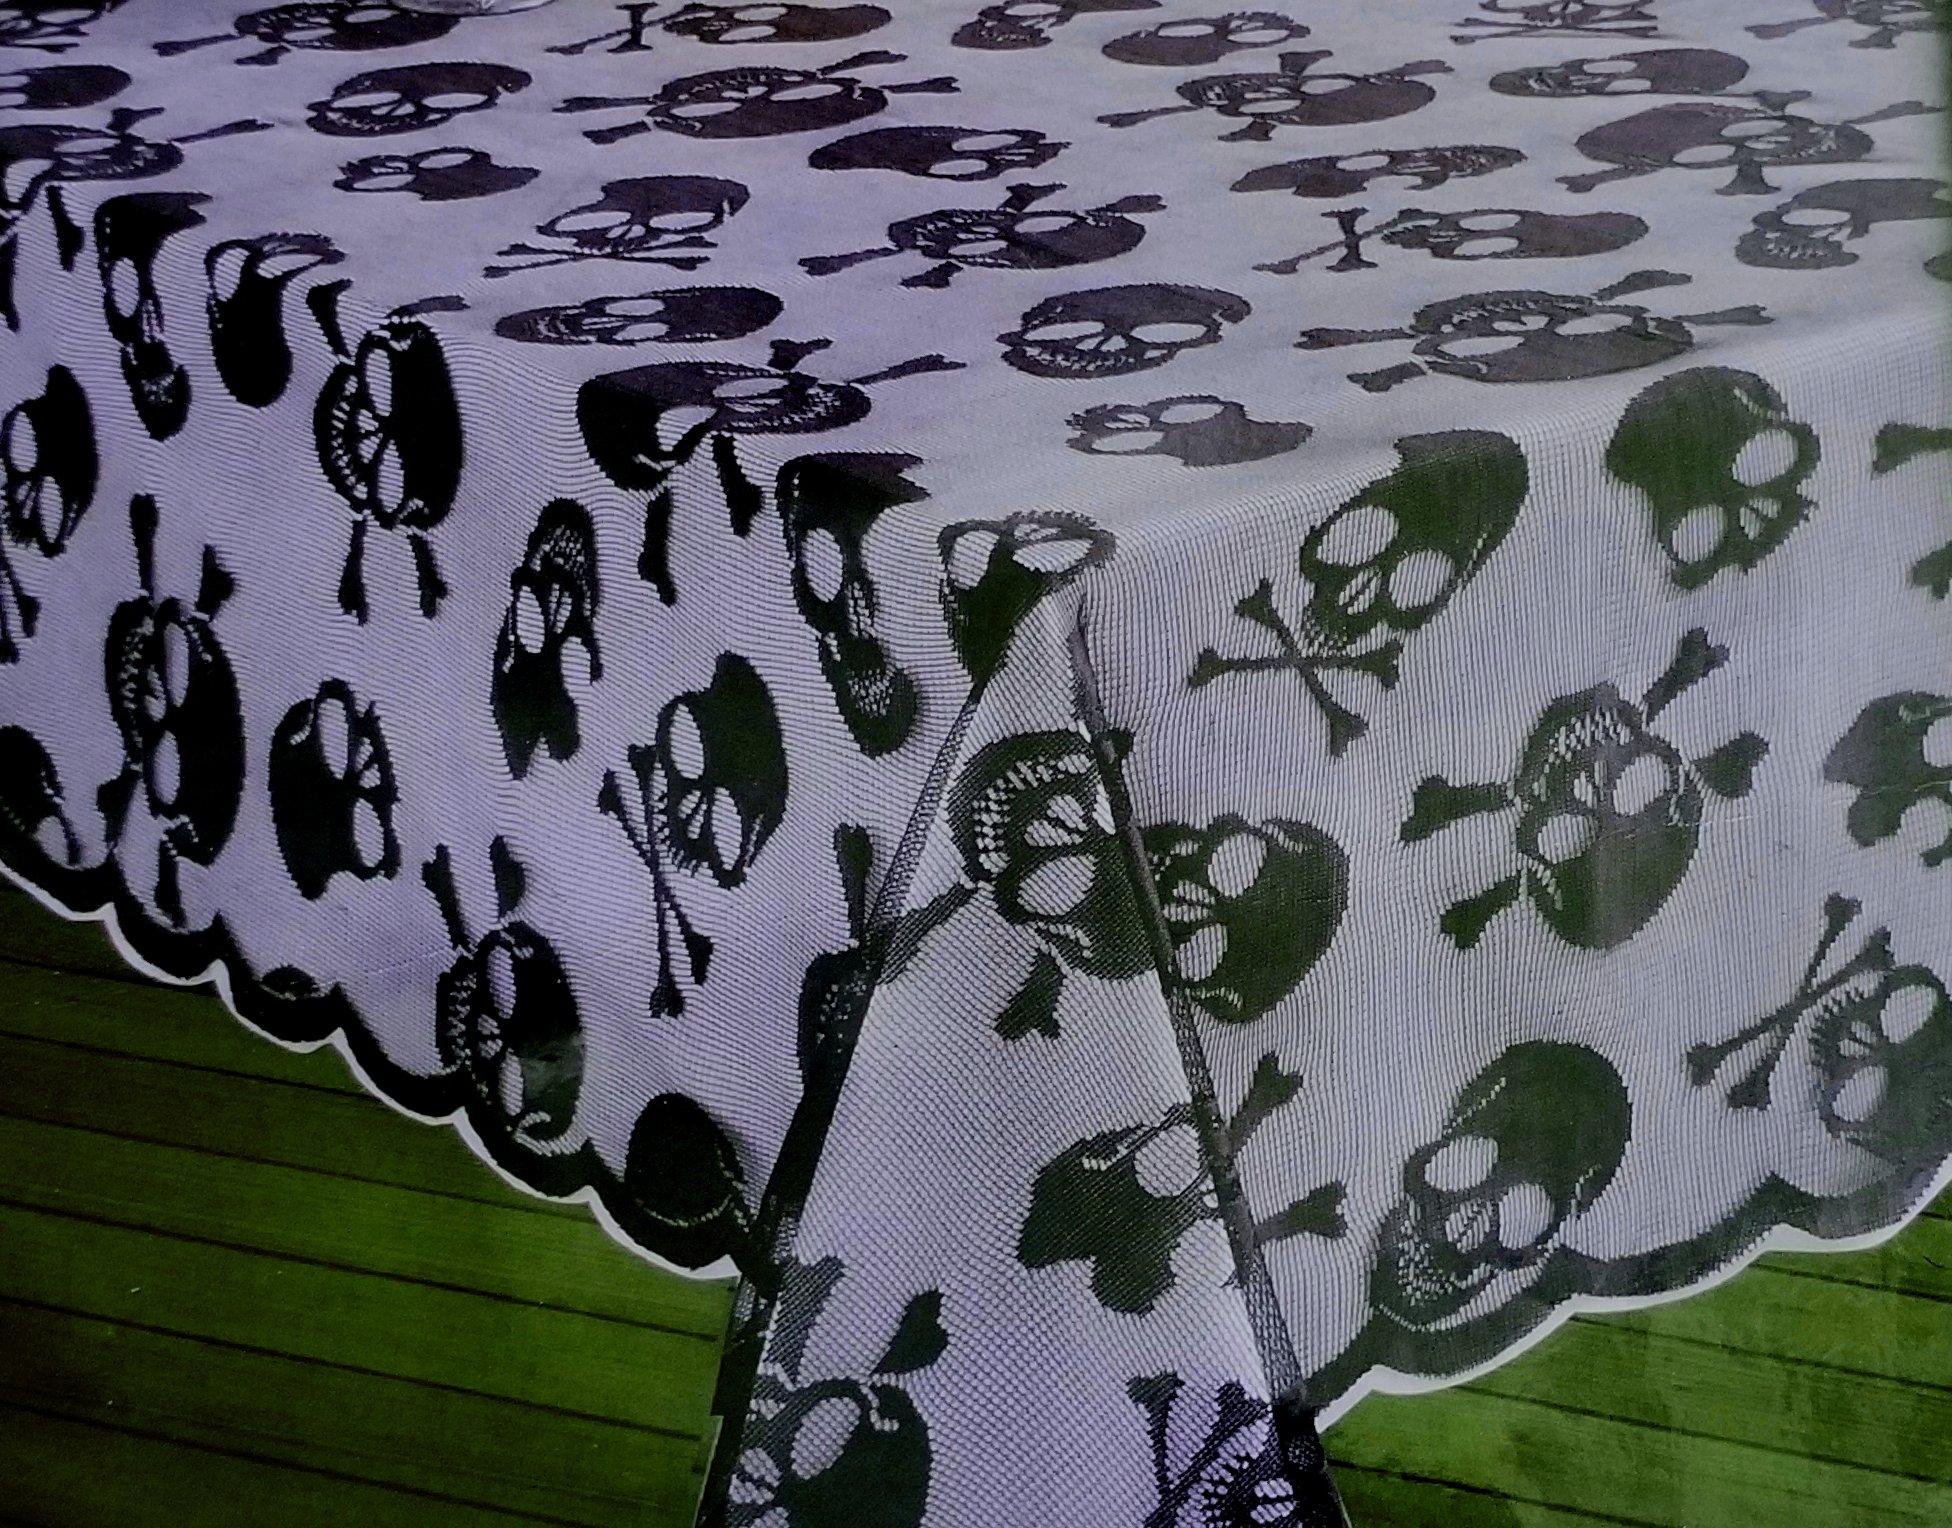 Skull & Bones Black Lace Halloween Tablecover, 60-by-84 Inch Oblong Rectangular